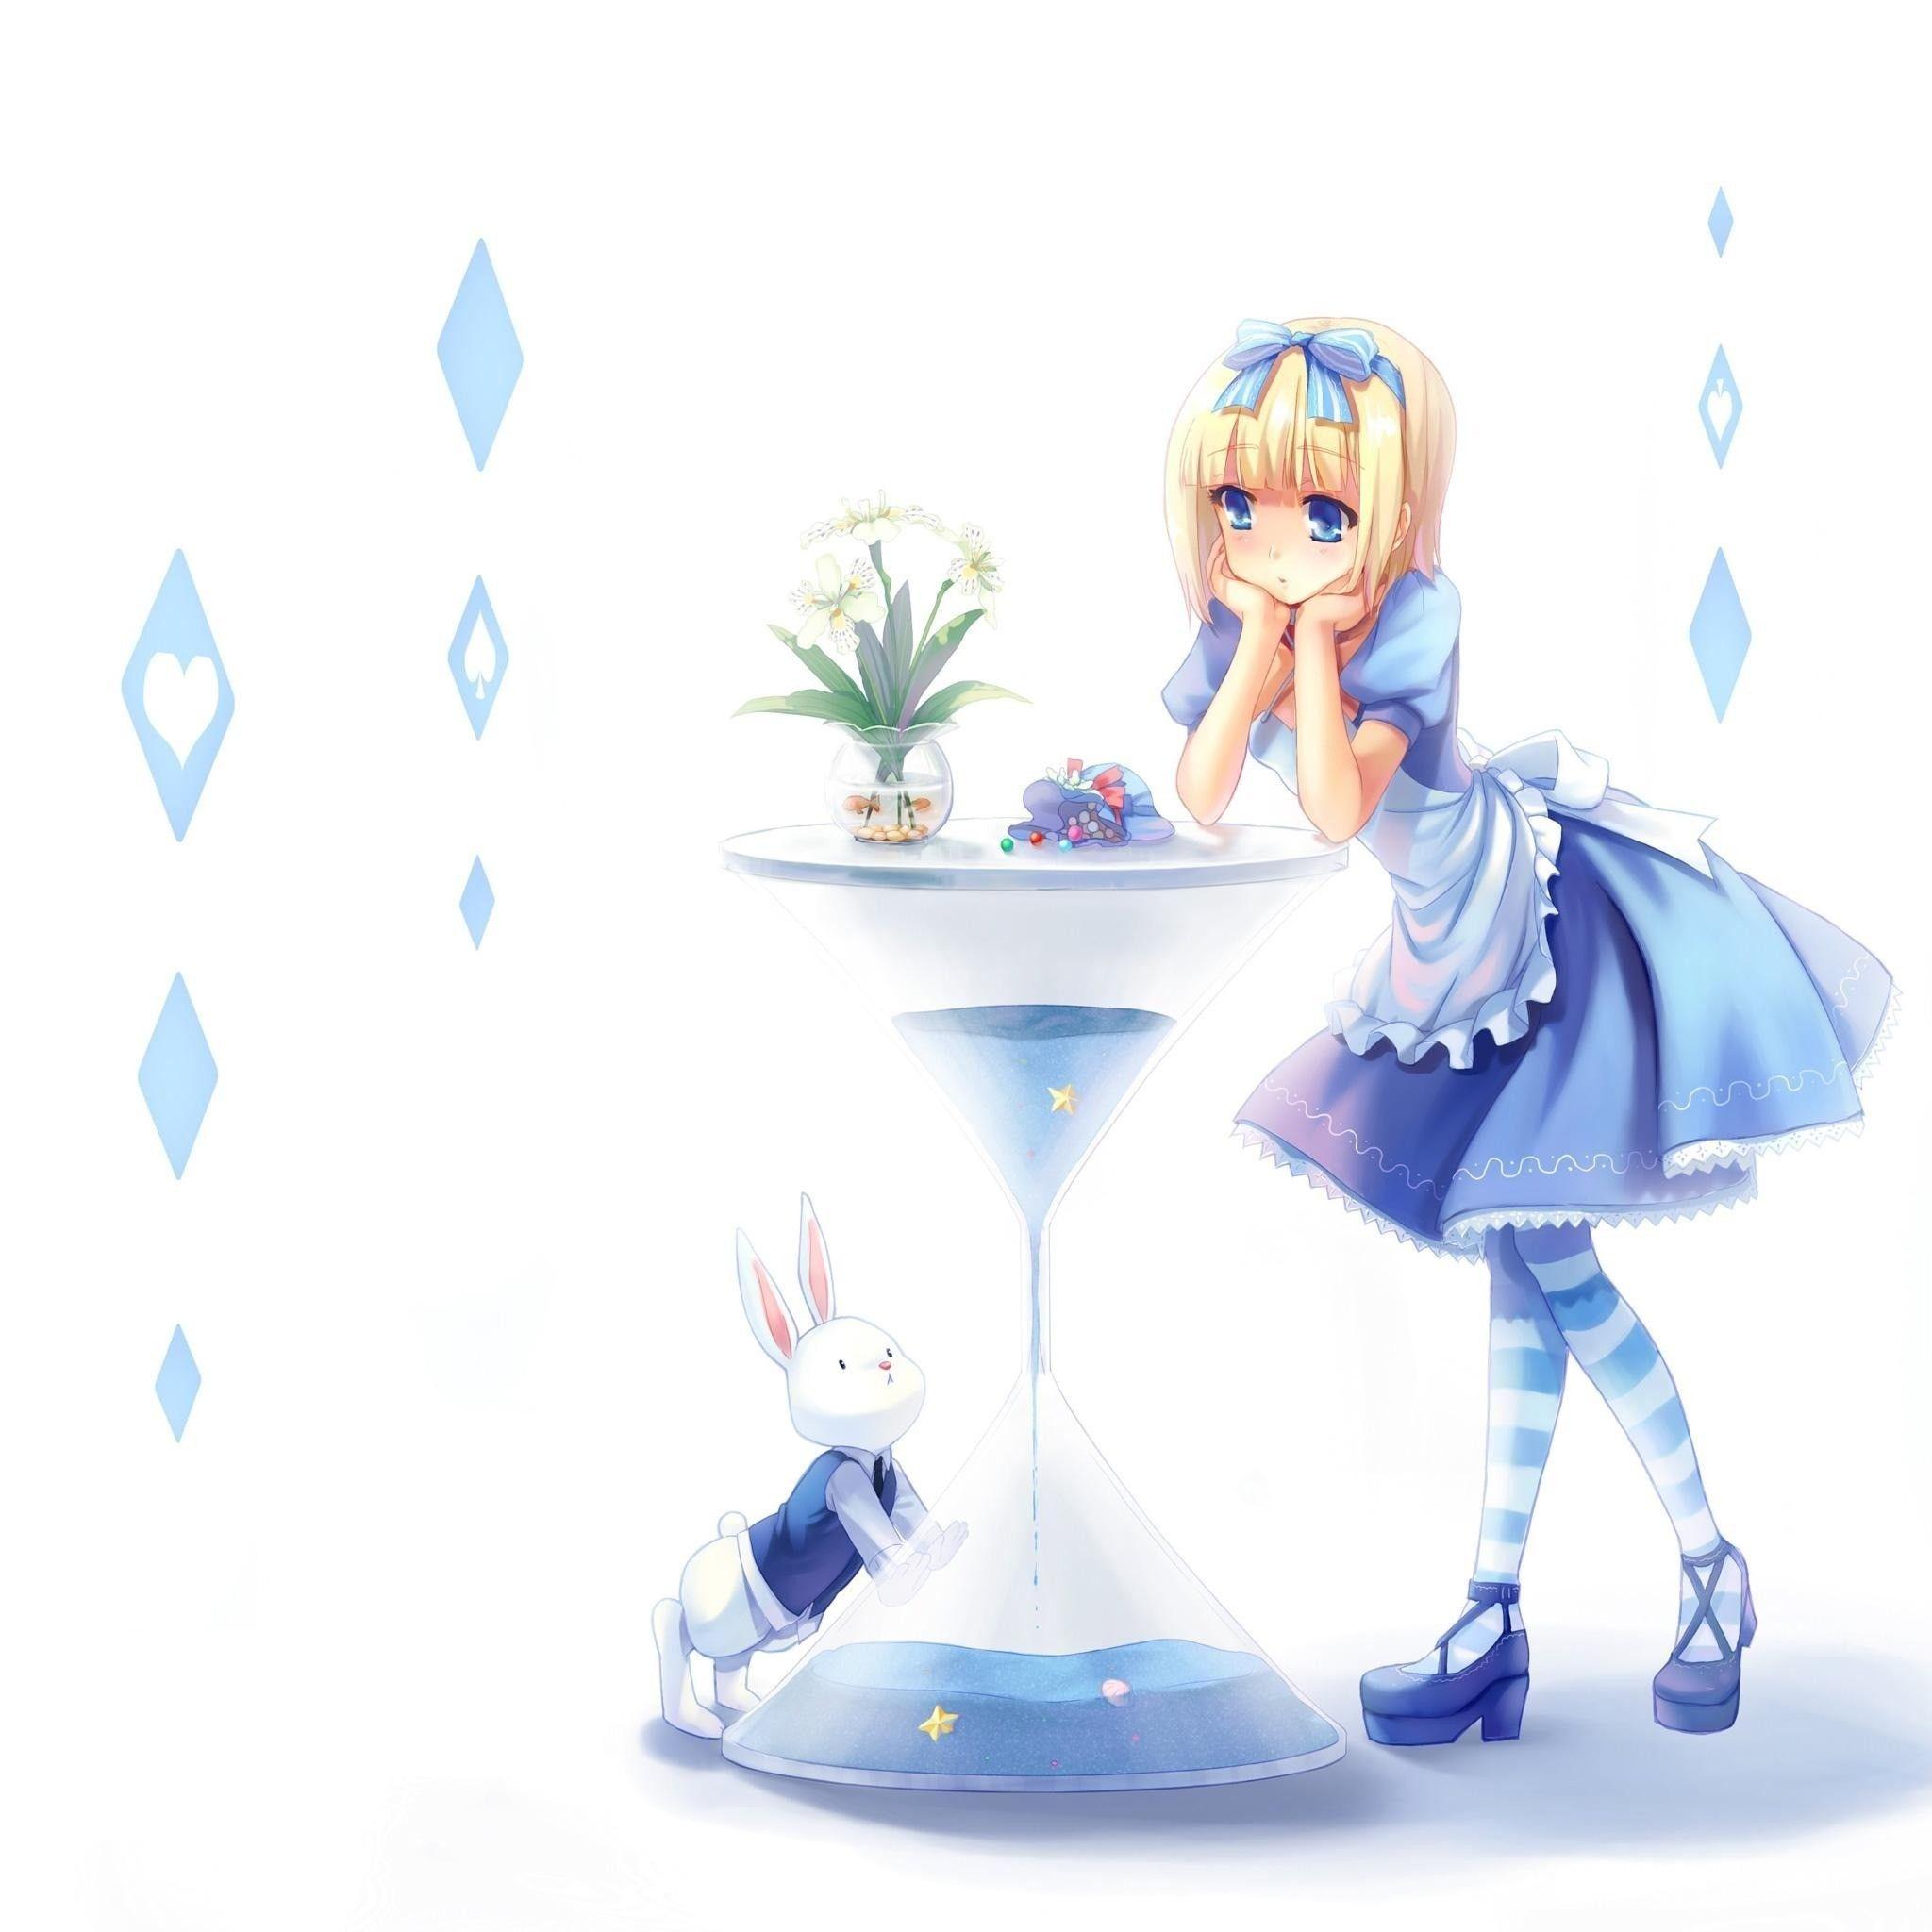 Cartoons 101 Alice anime, Alice in wonderland aesthetic